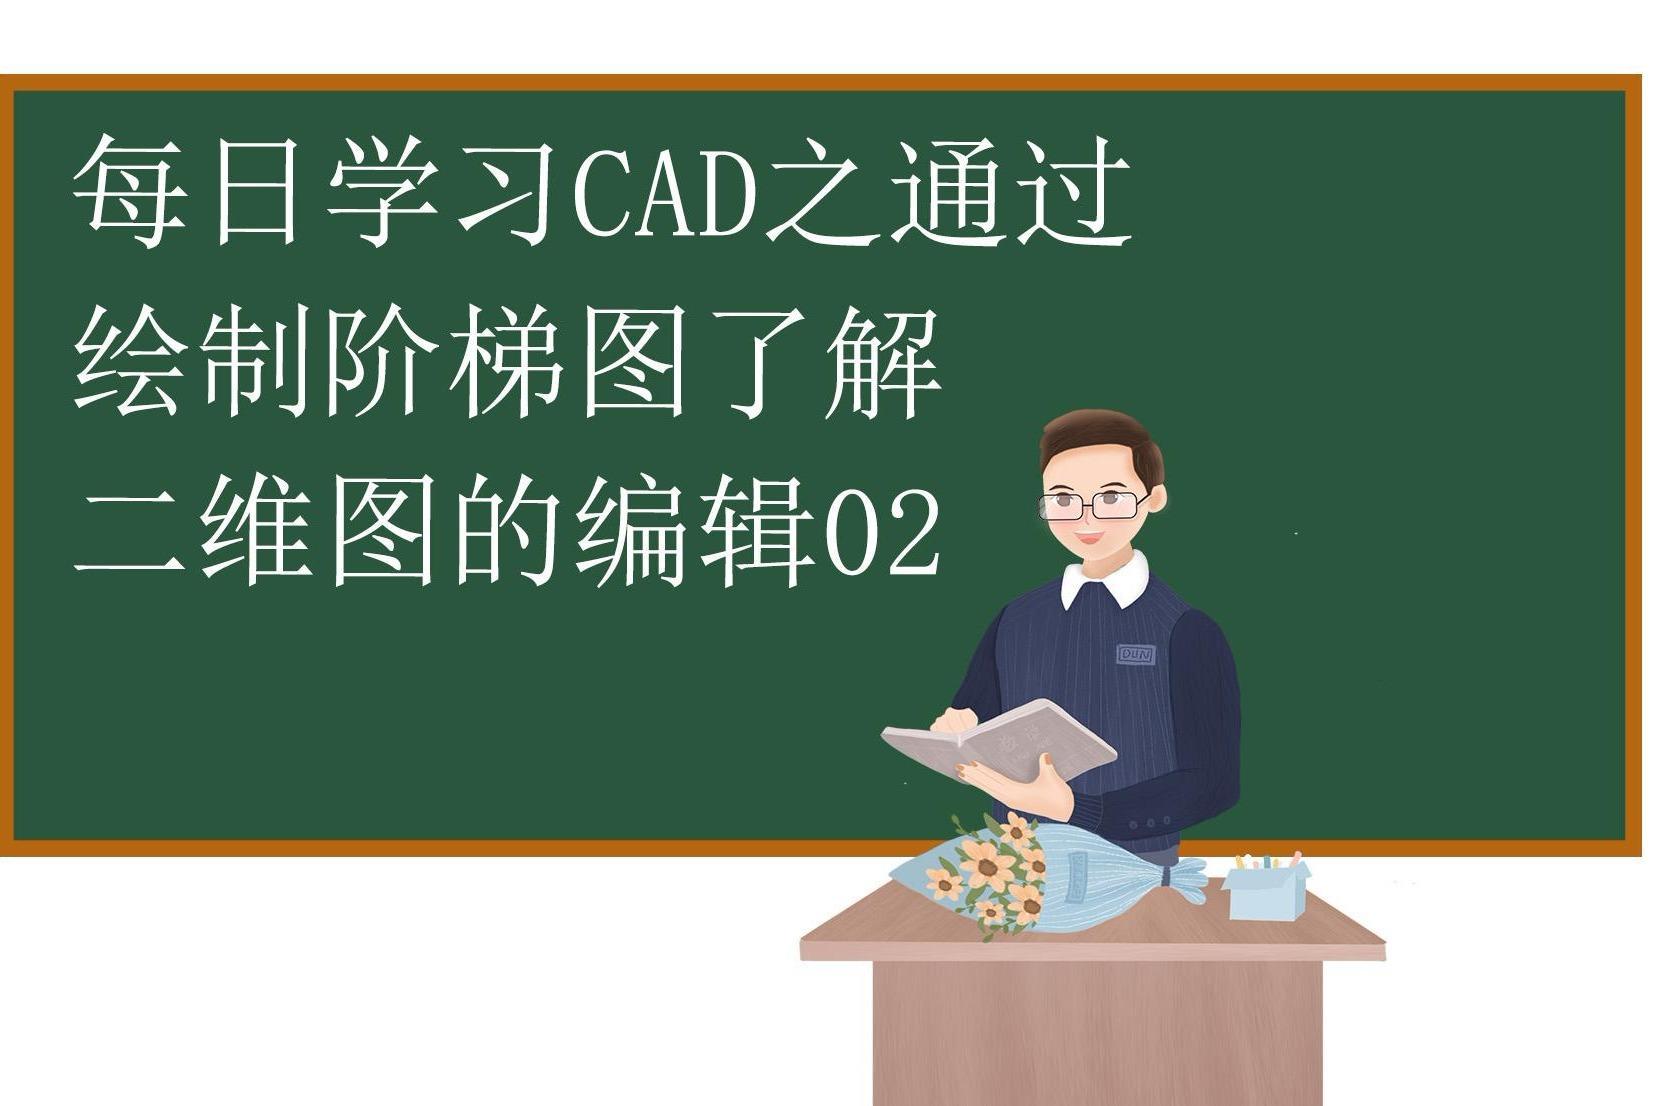 cadv教程教程渲染图形flash毕业论文广告设计:flash广告设计环保与实的公益图片